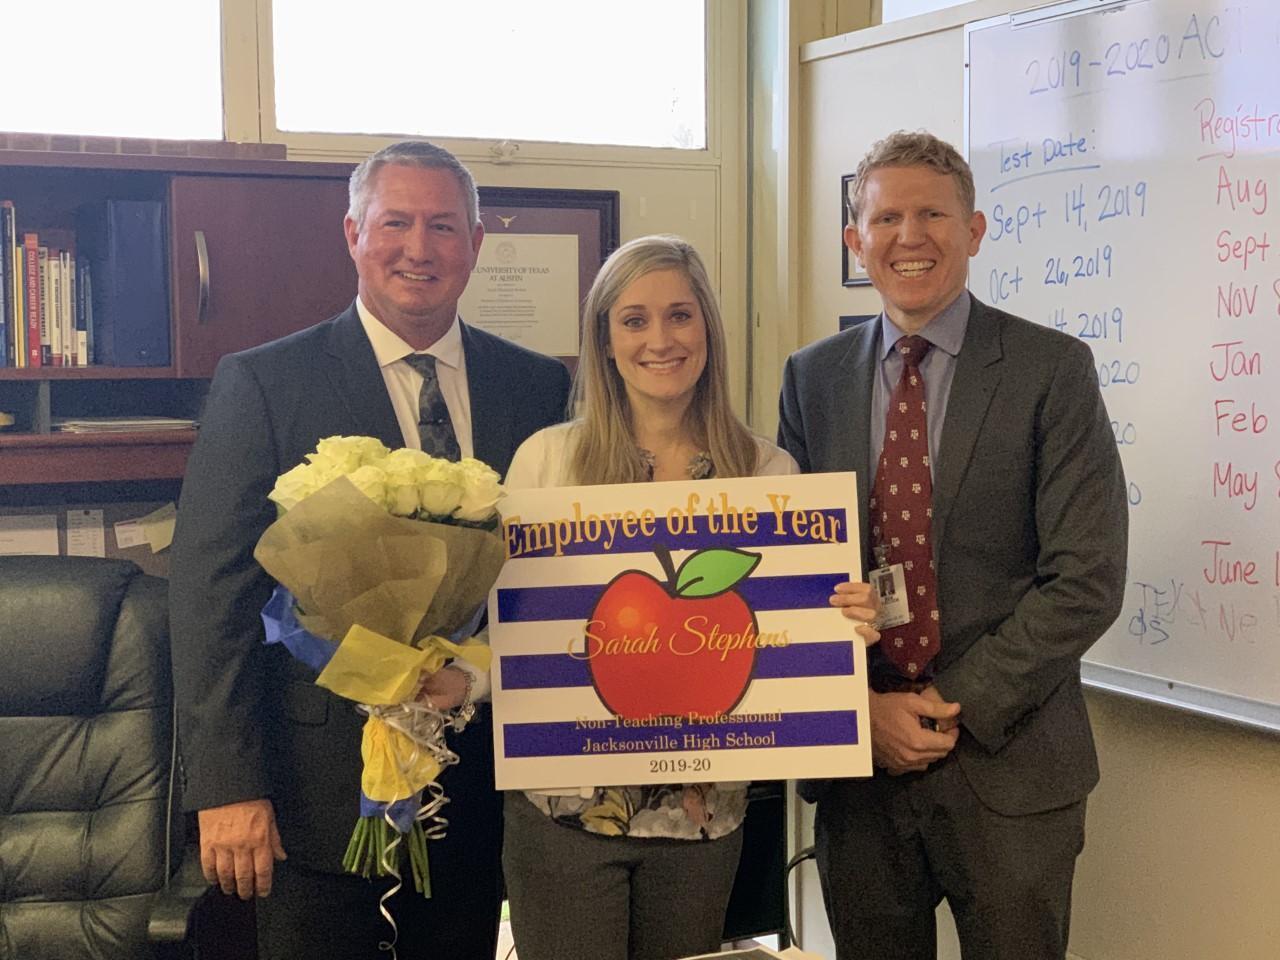 sarah stephens with superintendent and principal